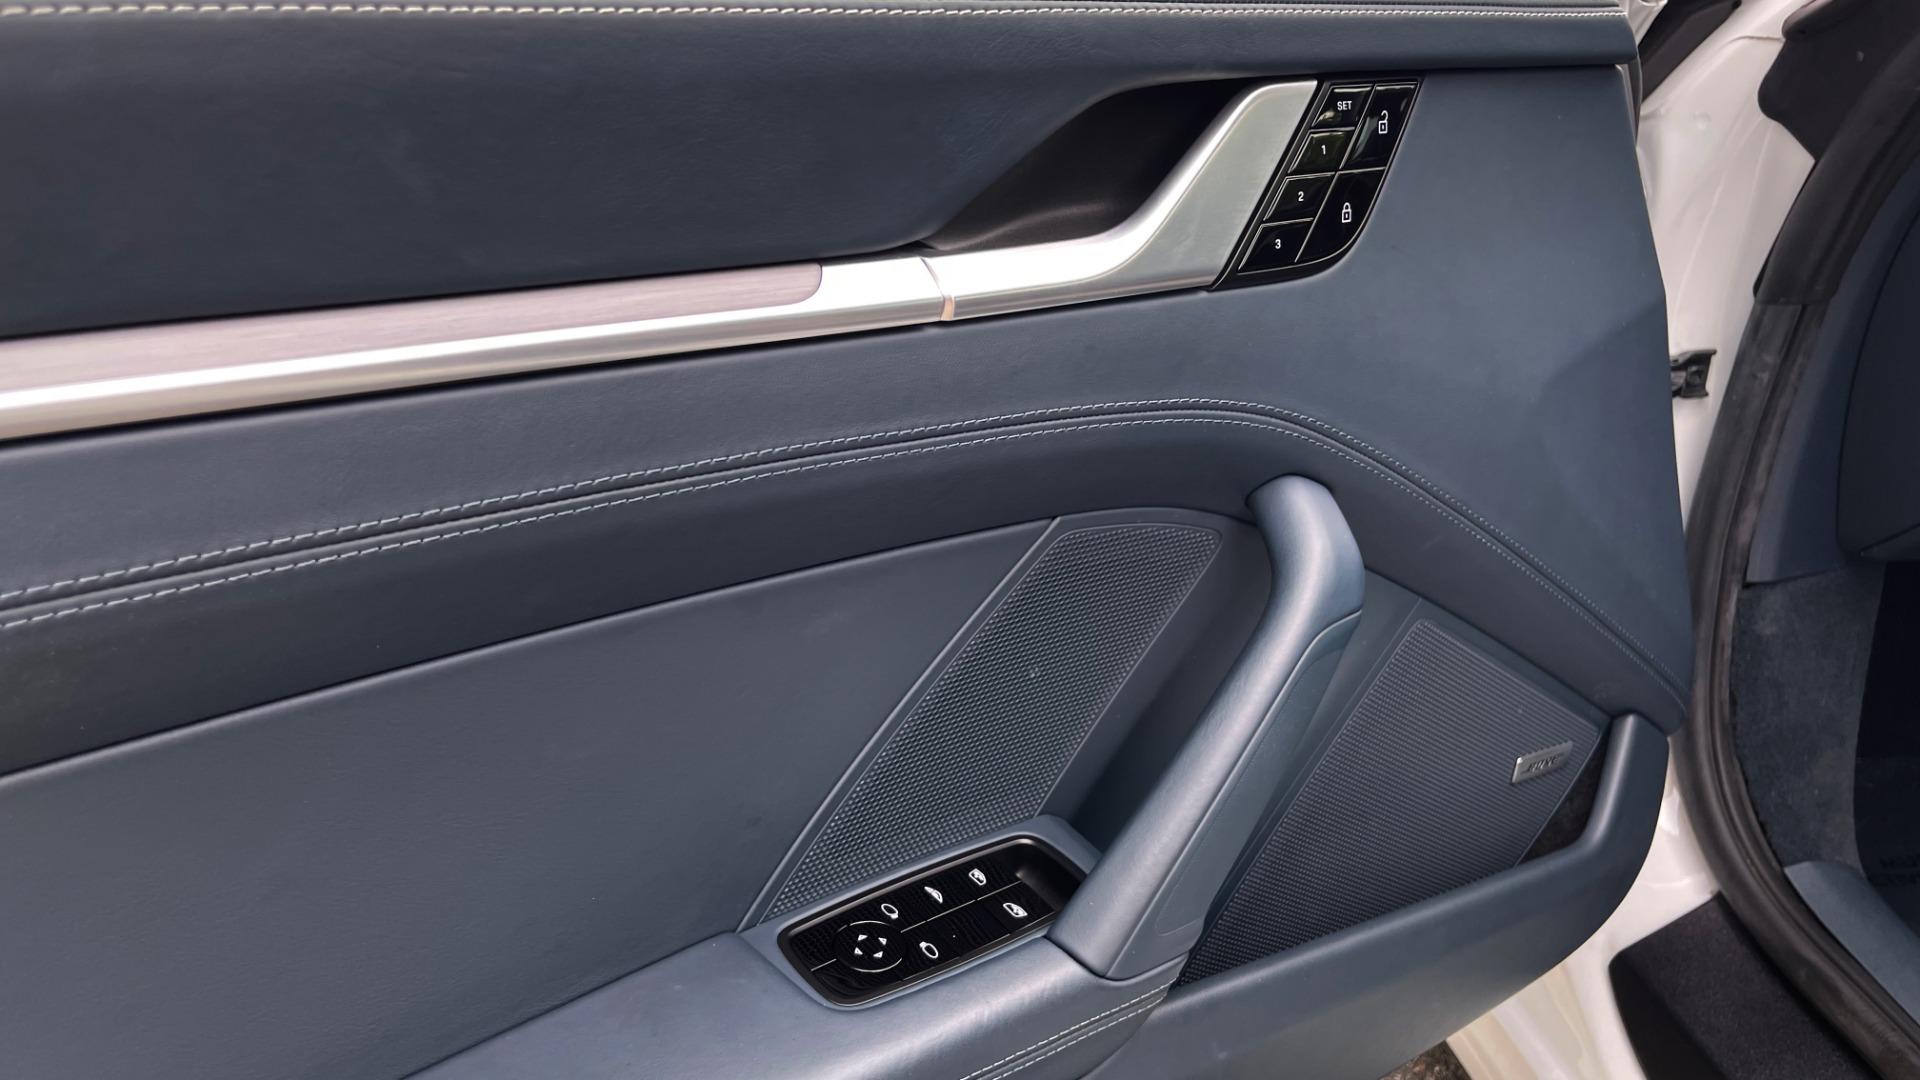 Used 2020 Porsche 911 CARRERA 4S CABRIOLET PREMIUM SPORT PKG / NAV / BOSE / LIGHT DESIGN PKG for sale $167,595 at Formula Imports in Charlotte NC 28227 40